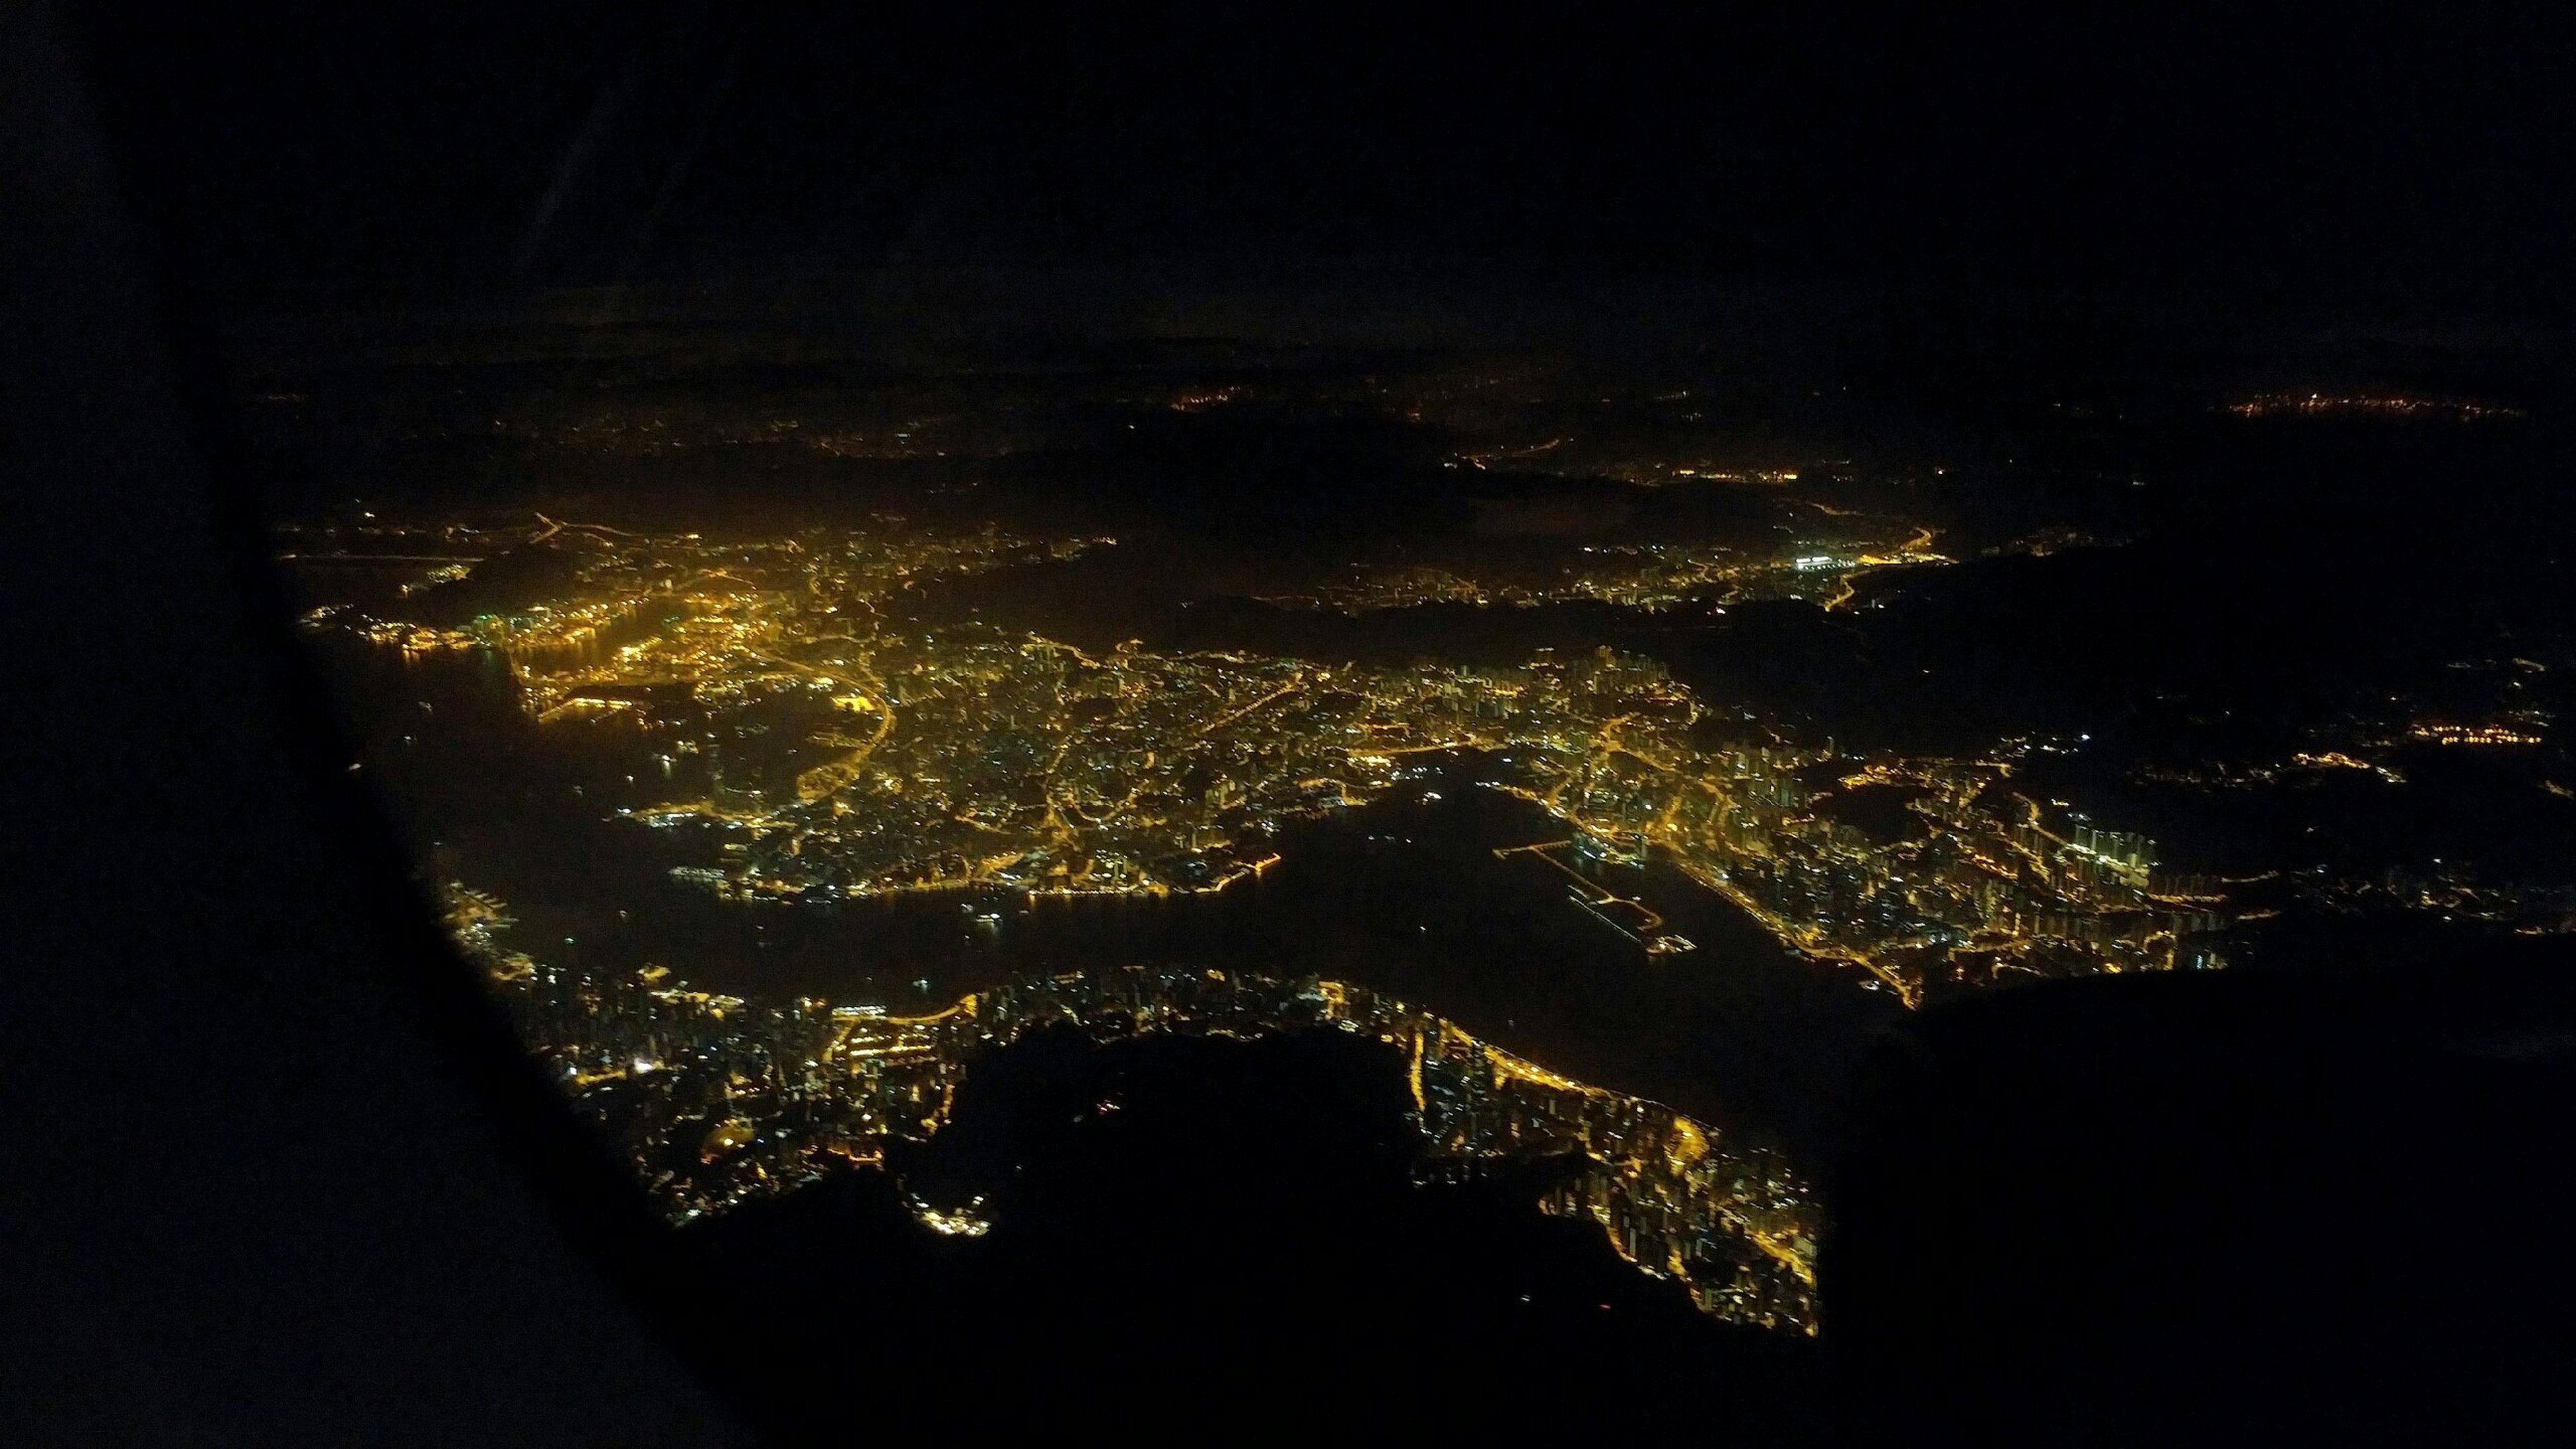 night, illuminated, no people, celebration, christmas, sky, christmas decoration, city, close-up, outdoors, star - space, black background